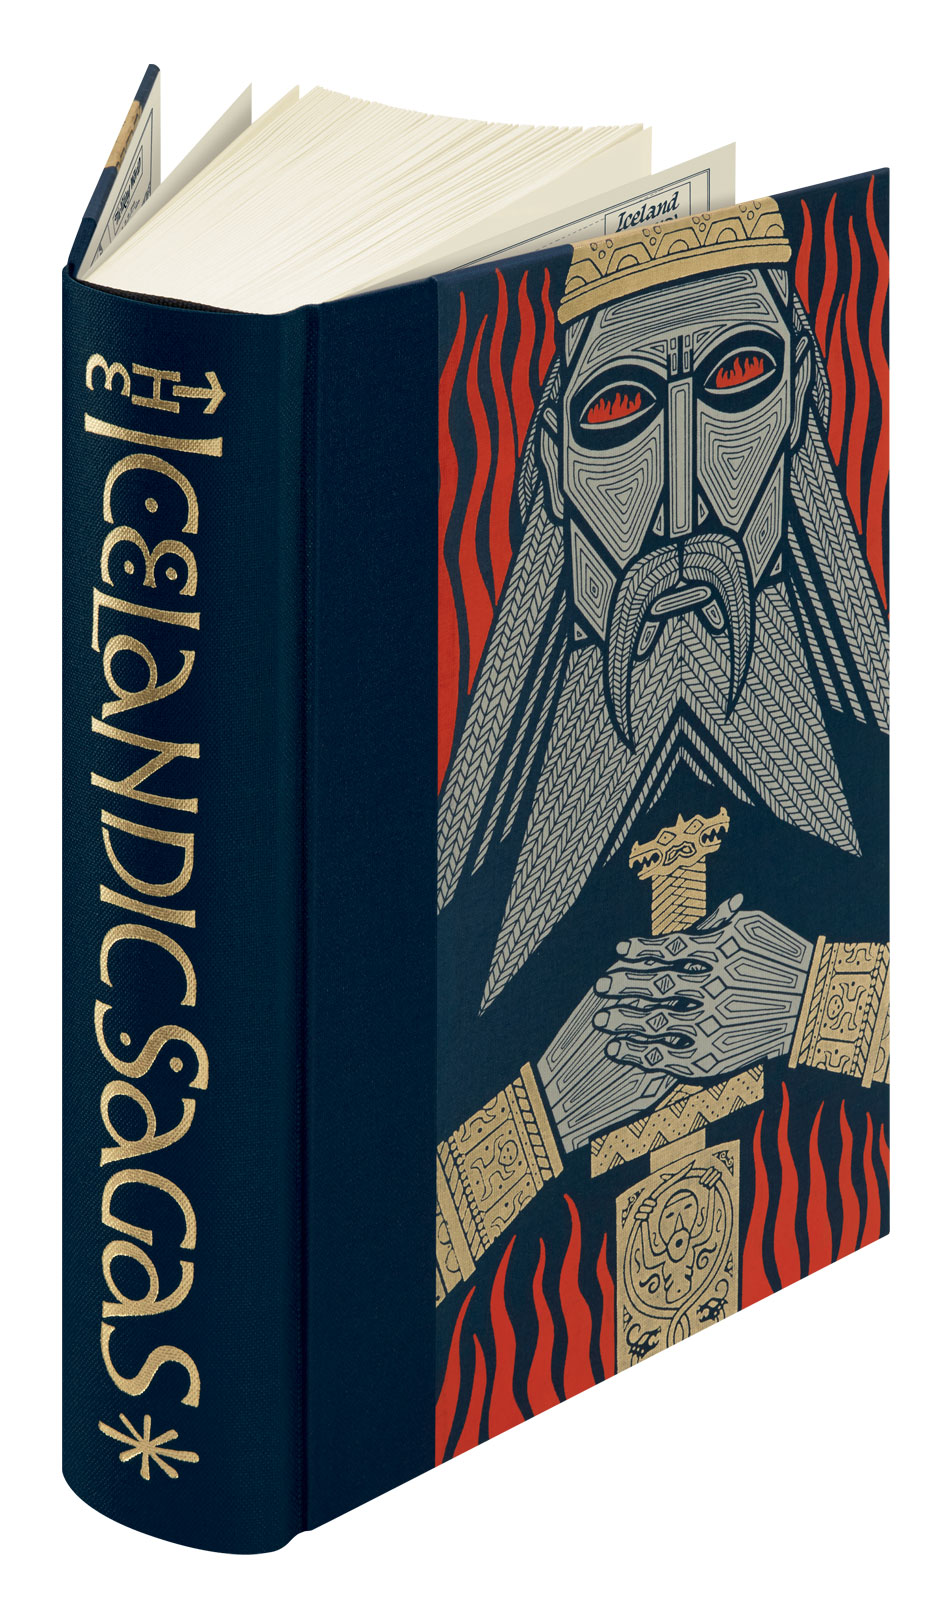 FS Icelandic Sagas 1 – beautifulbooks.info